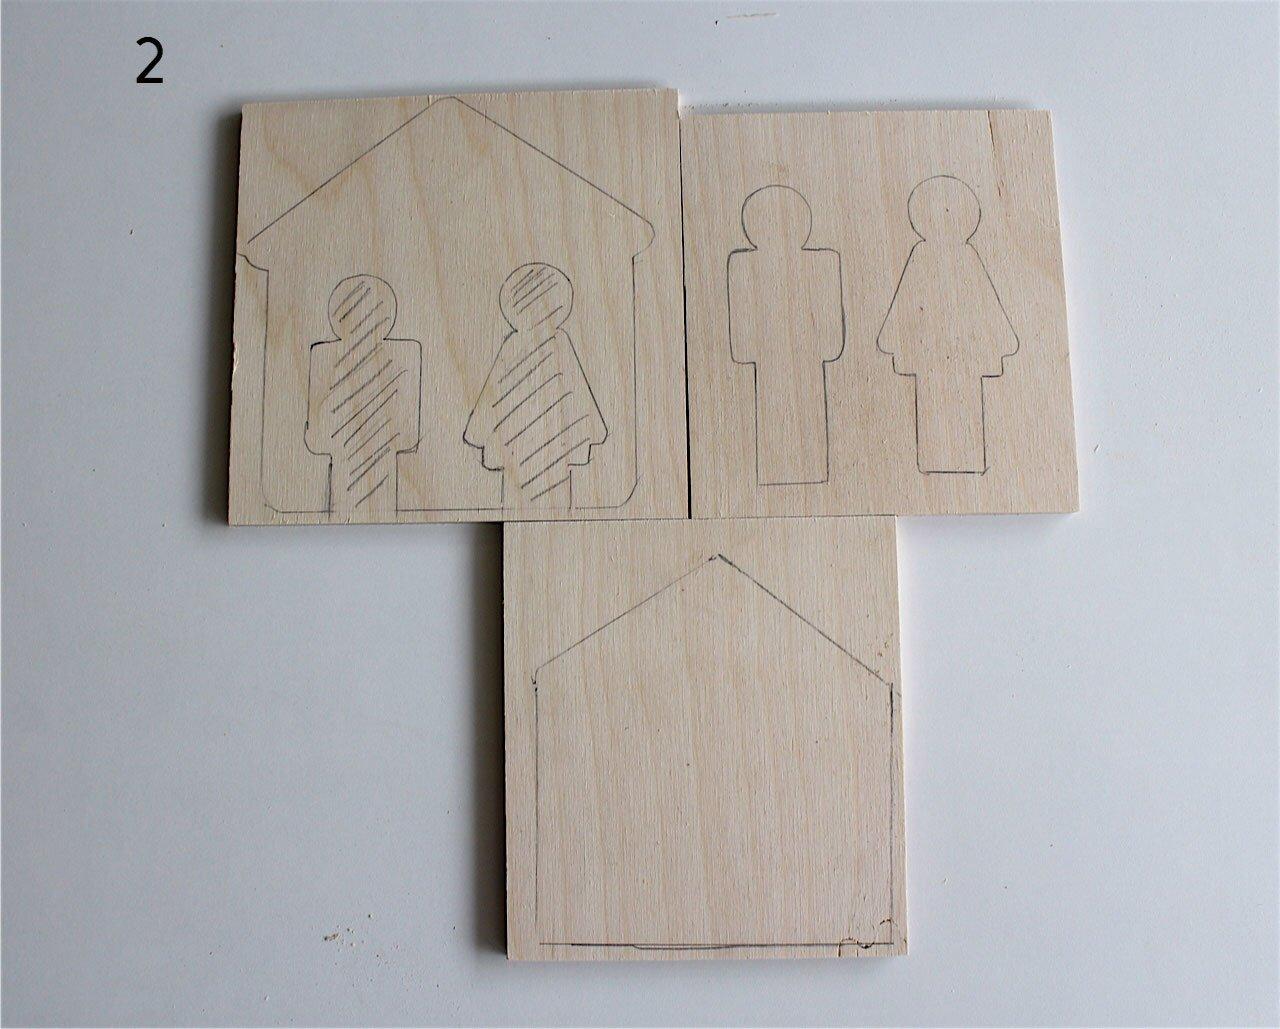 Il portachiavi in legno da parete cose di casa - Portachiavi da parete design ...